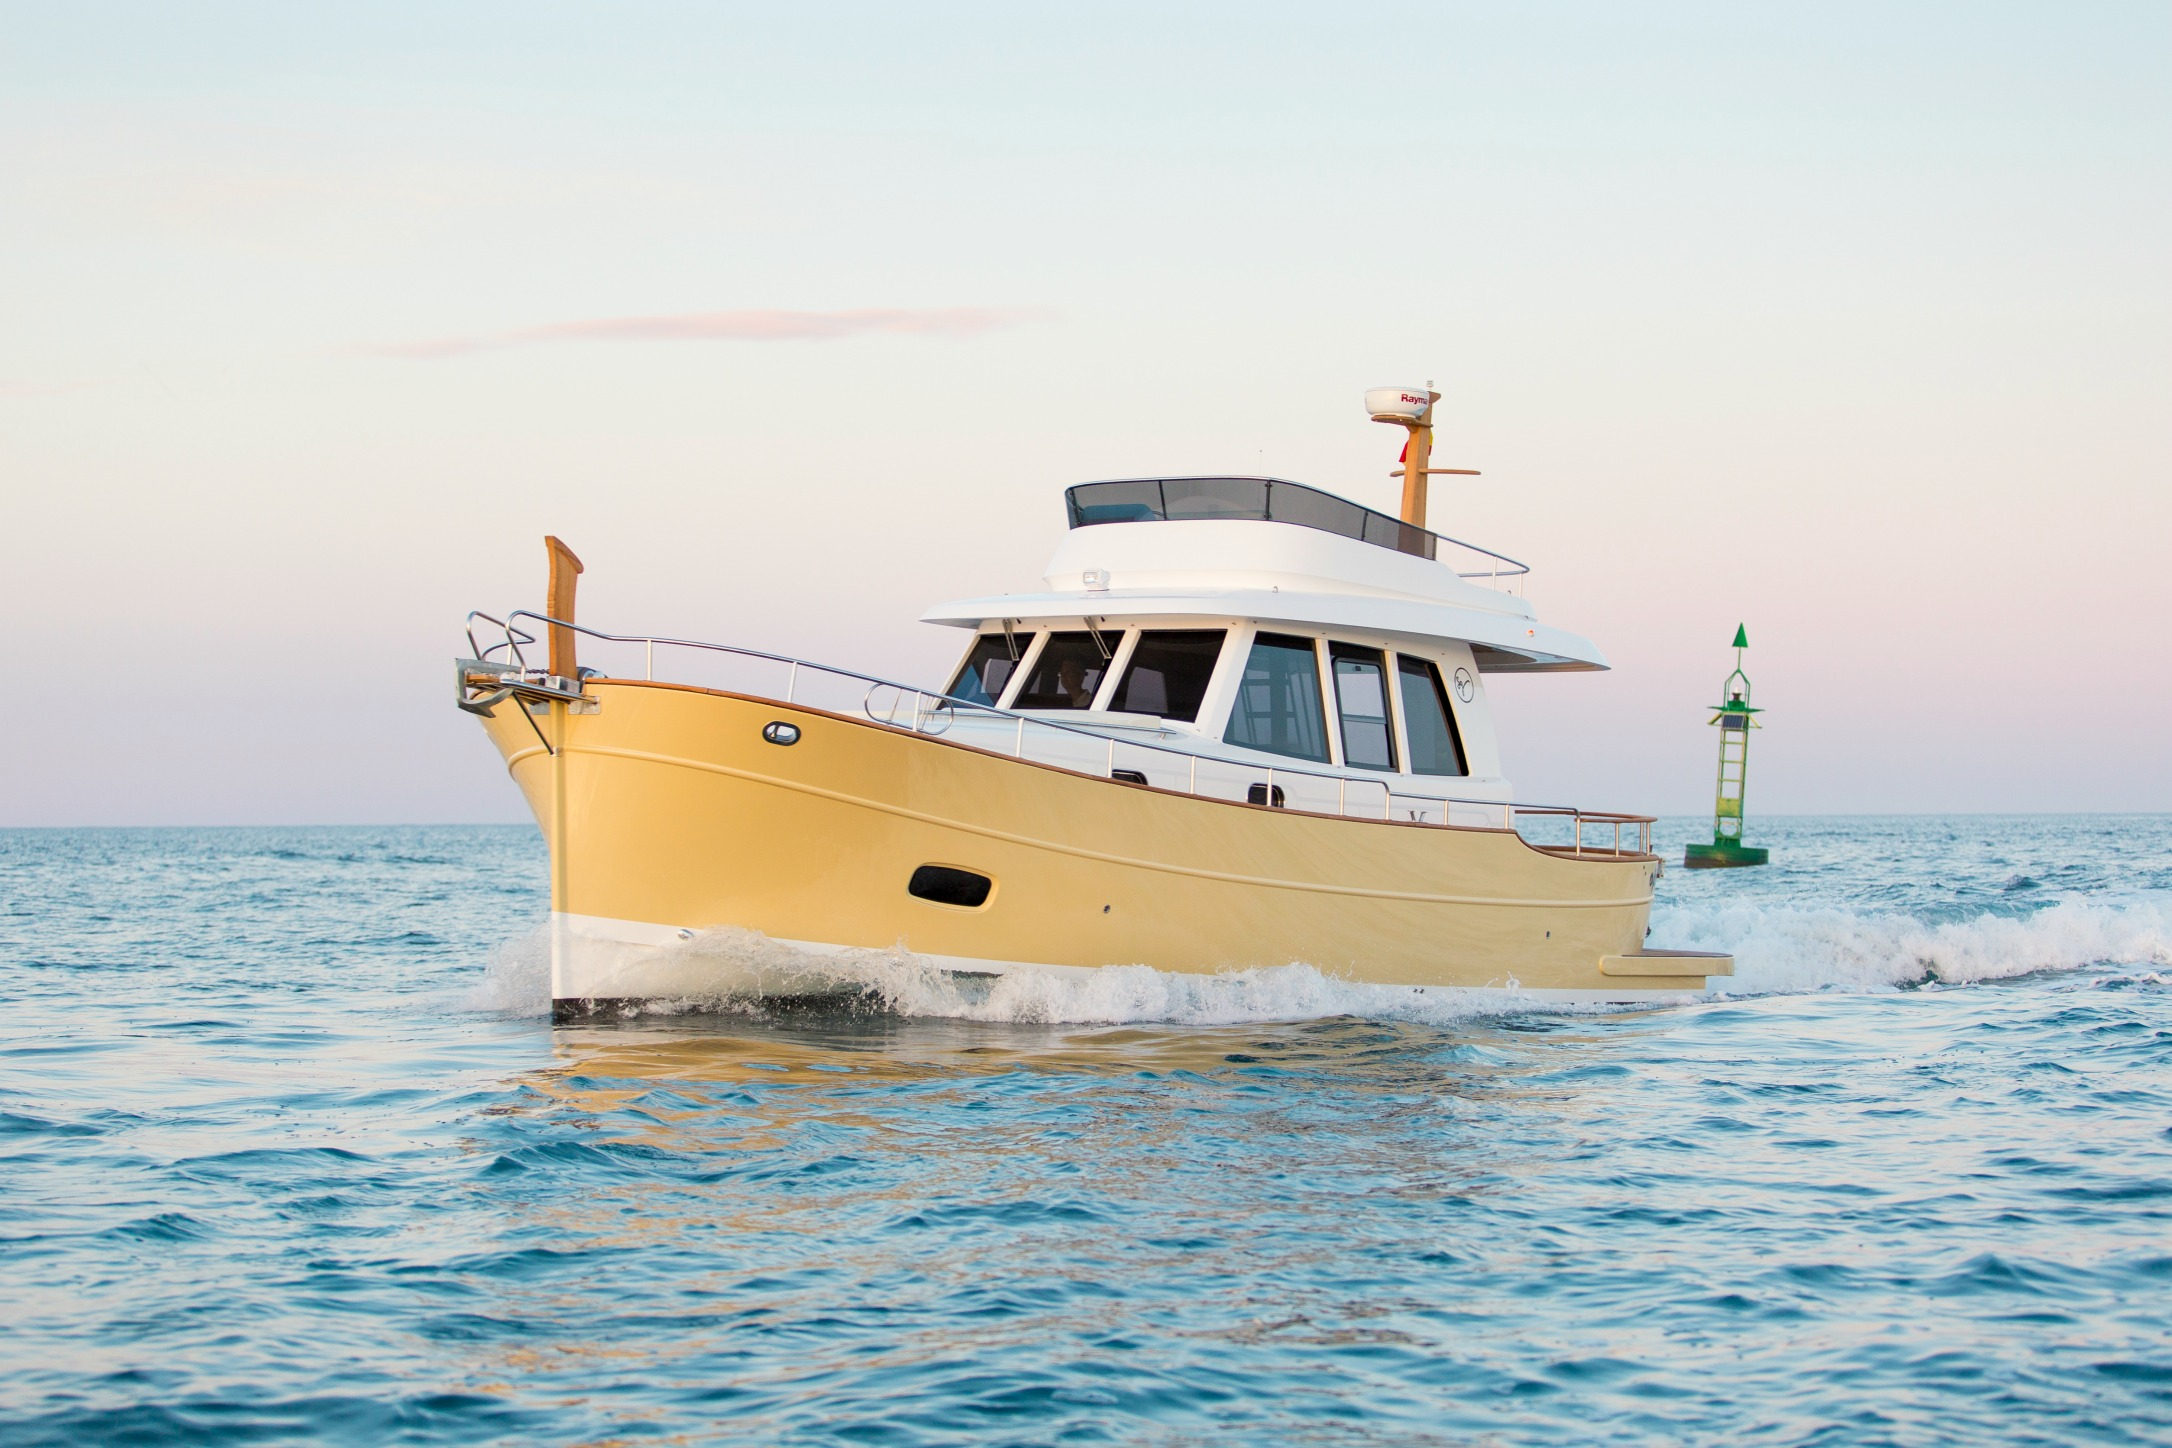 Minorca Islander 42 flybridge yacht for sale - Running